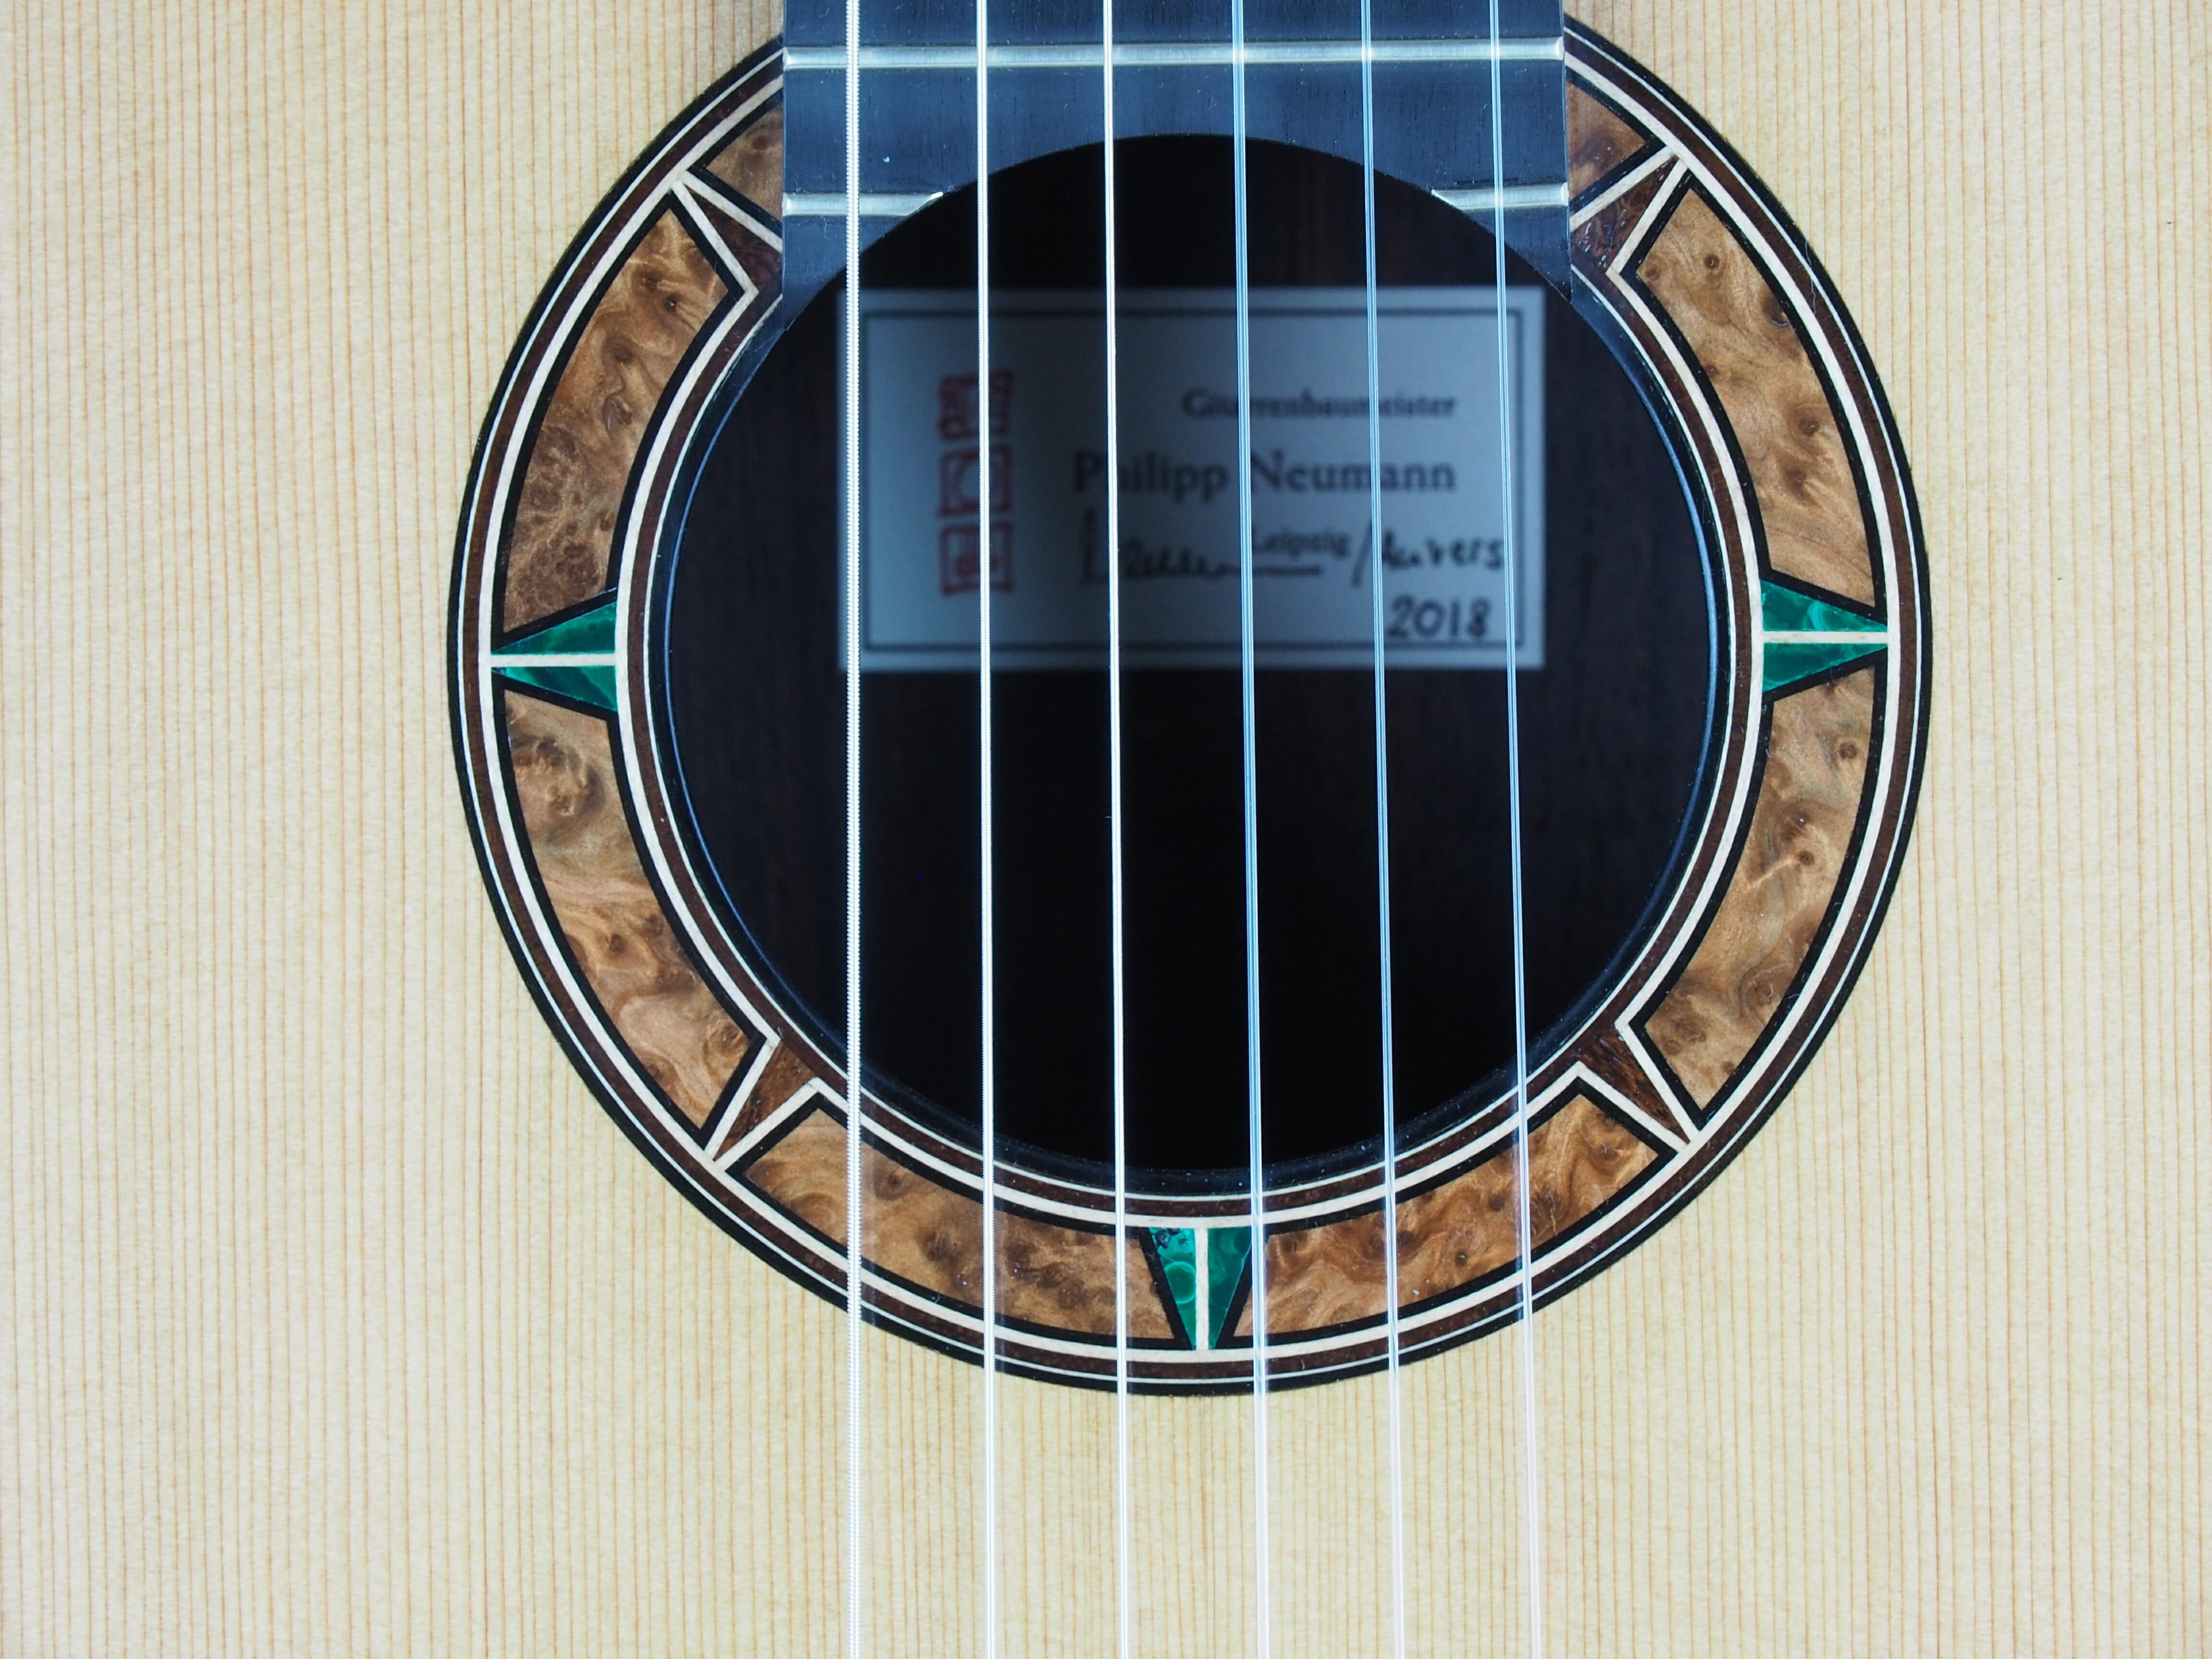 Luthier Philipp Neumann guitare classique 18NEU018-10